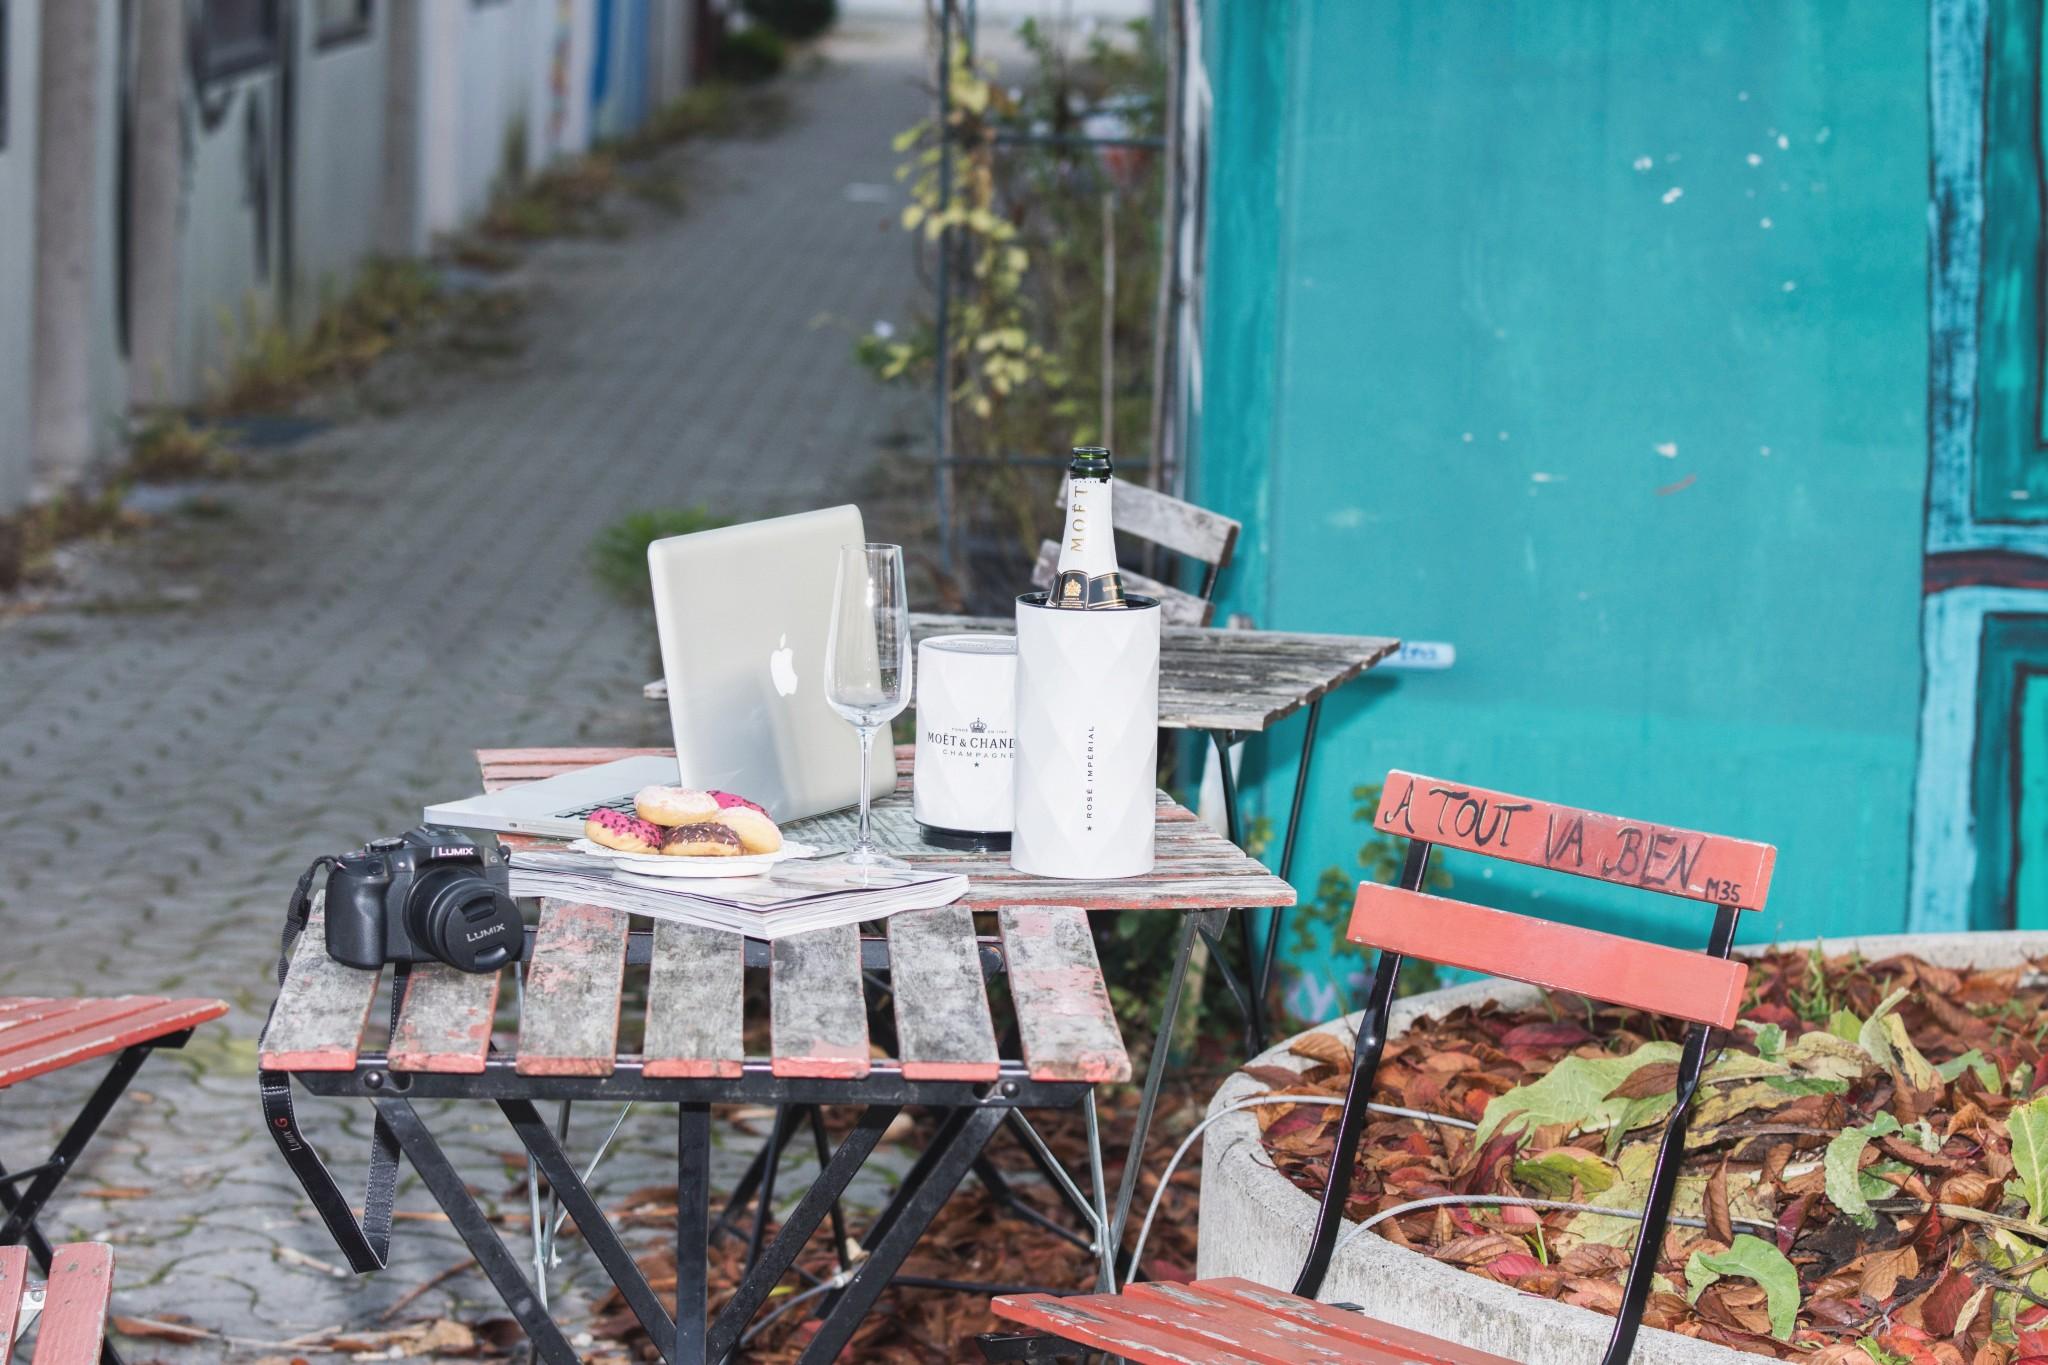 Panasonic Lumix, Kamera, München, Olympisches Dorf, Moet, Champagner, Apple, Macbook, Bistro, Bistrotisch